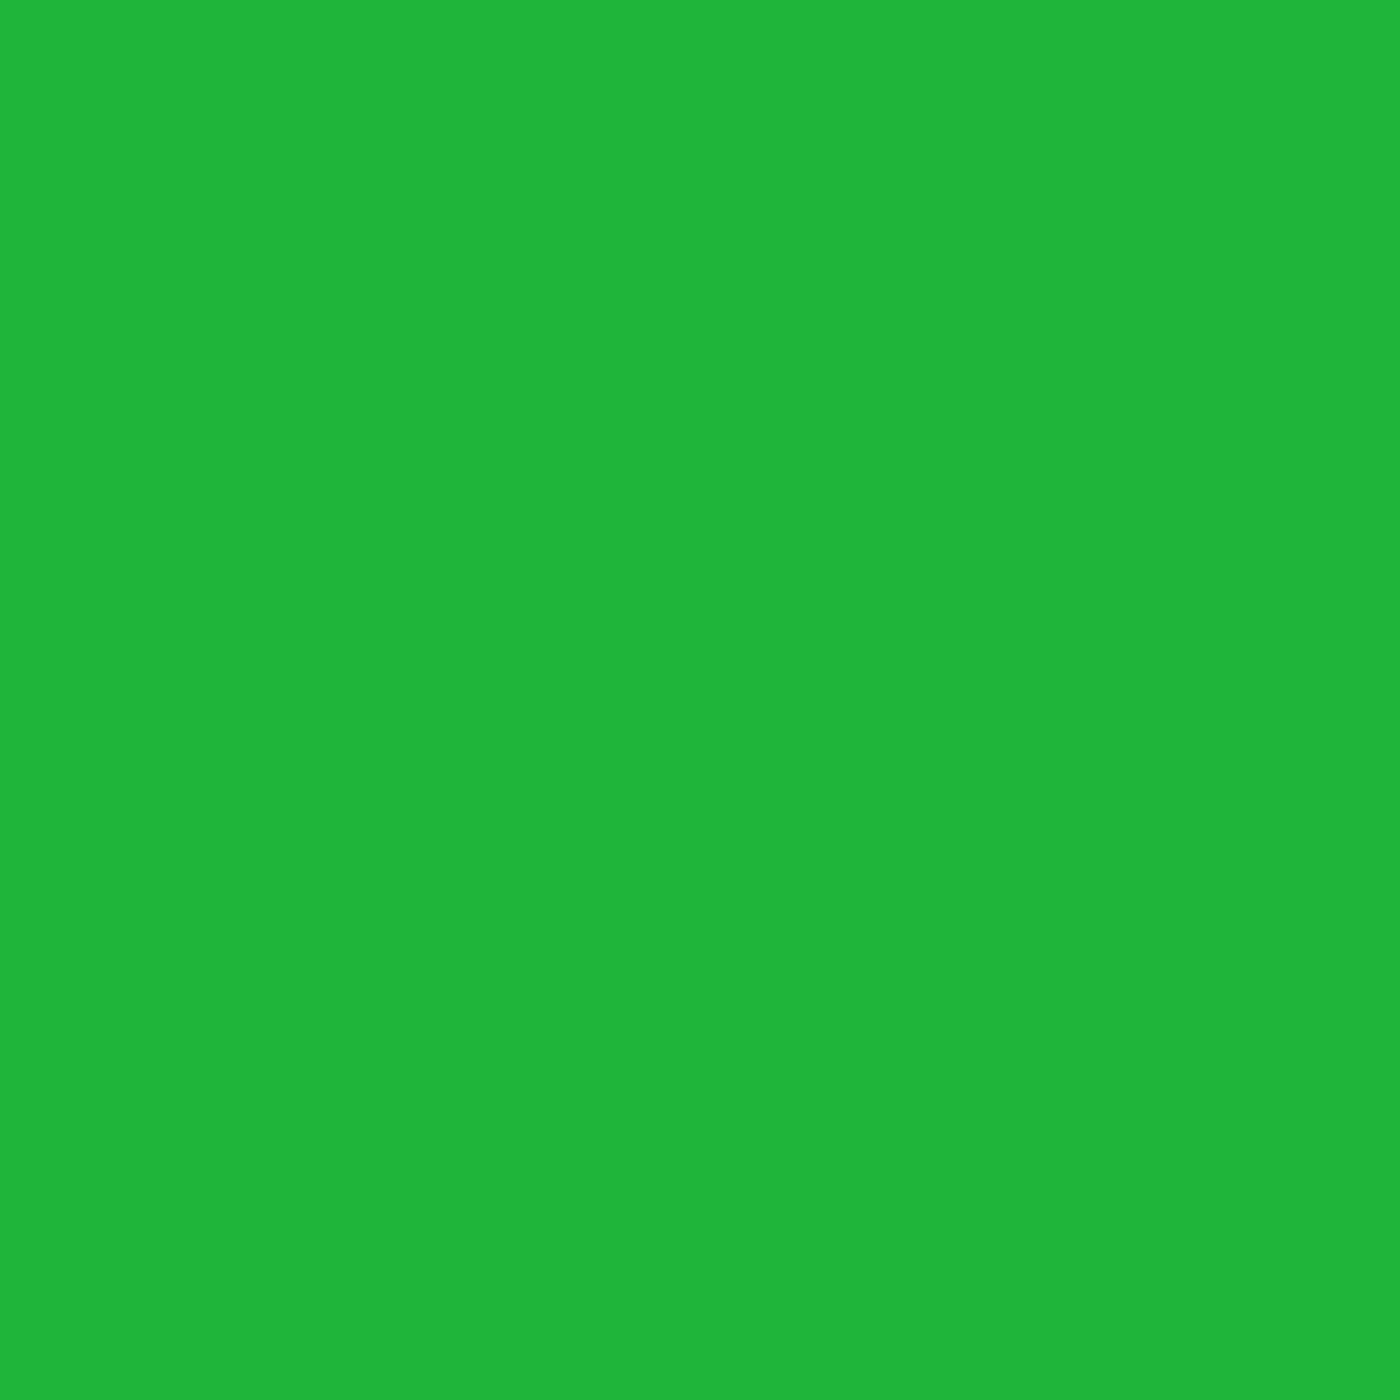 Oracal 651 Vinyl Roll 12'' x 50 yard (150 feet) (Yellow Green)